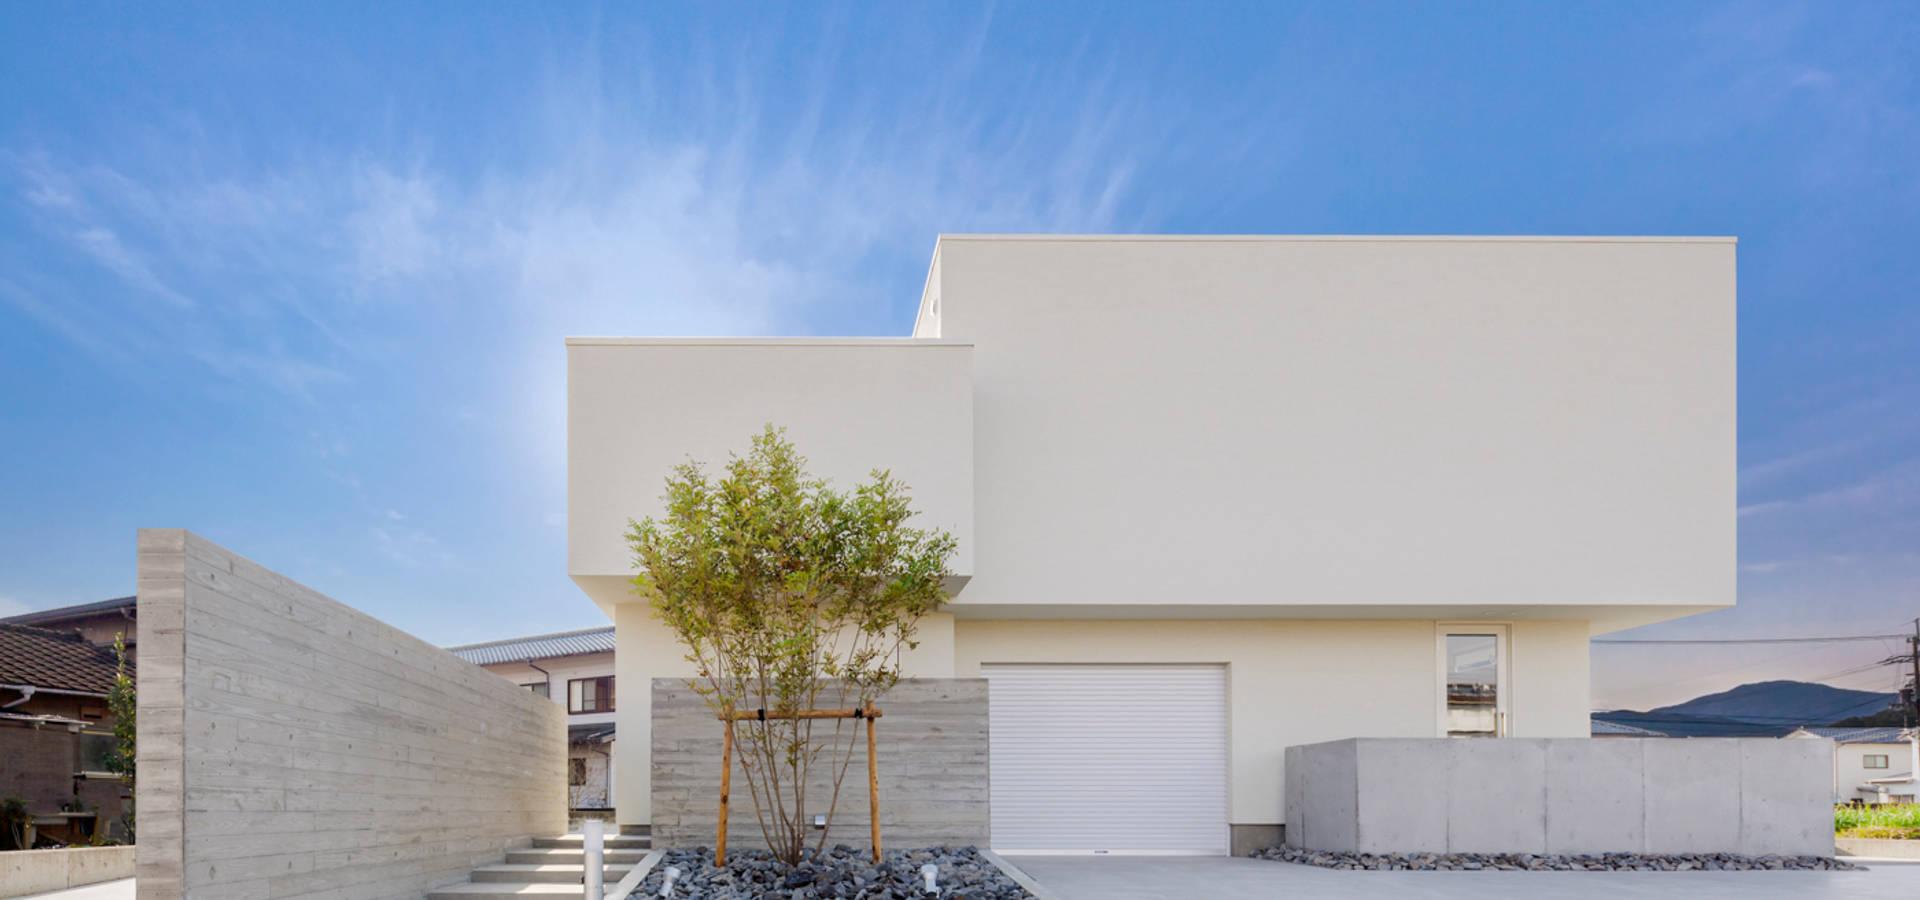 株式会社細川建築デザイン